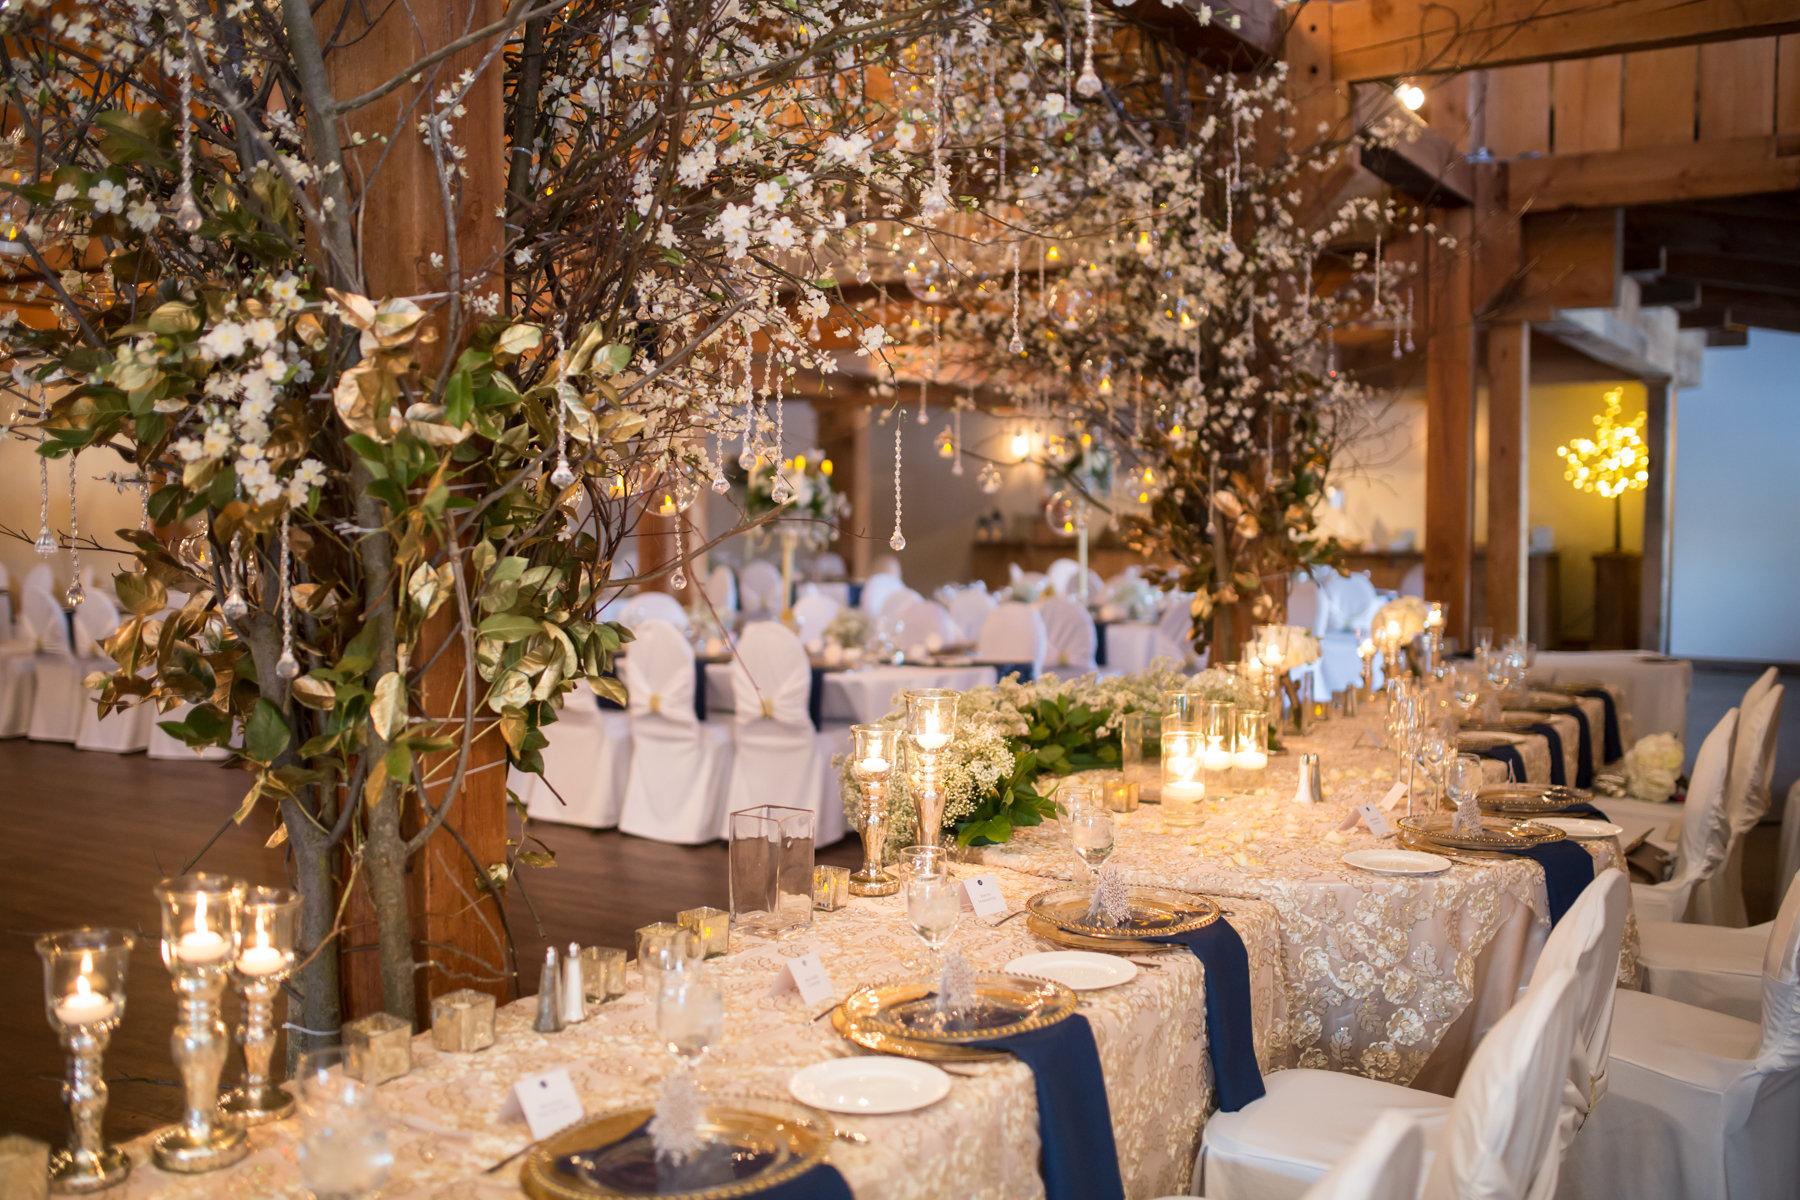 Bellamere Winery London Ontario Wedding Venue Beautiful Luxury Upscale Therapyboxfo